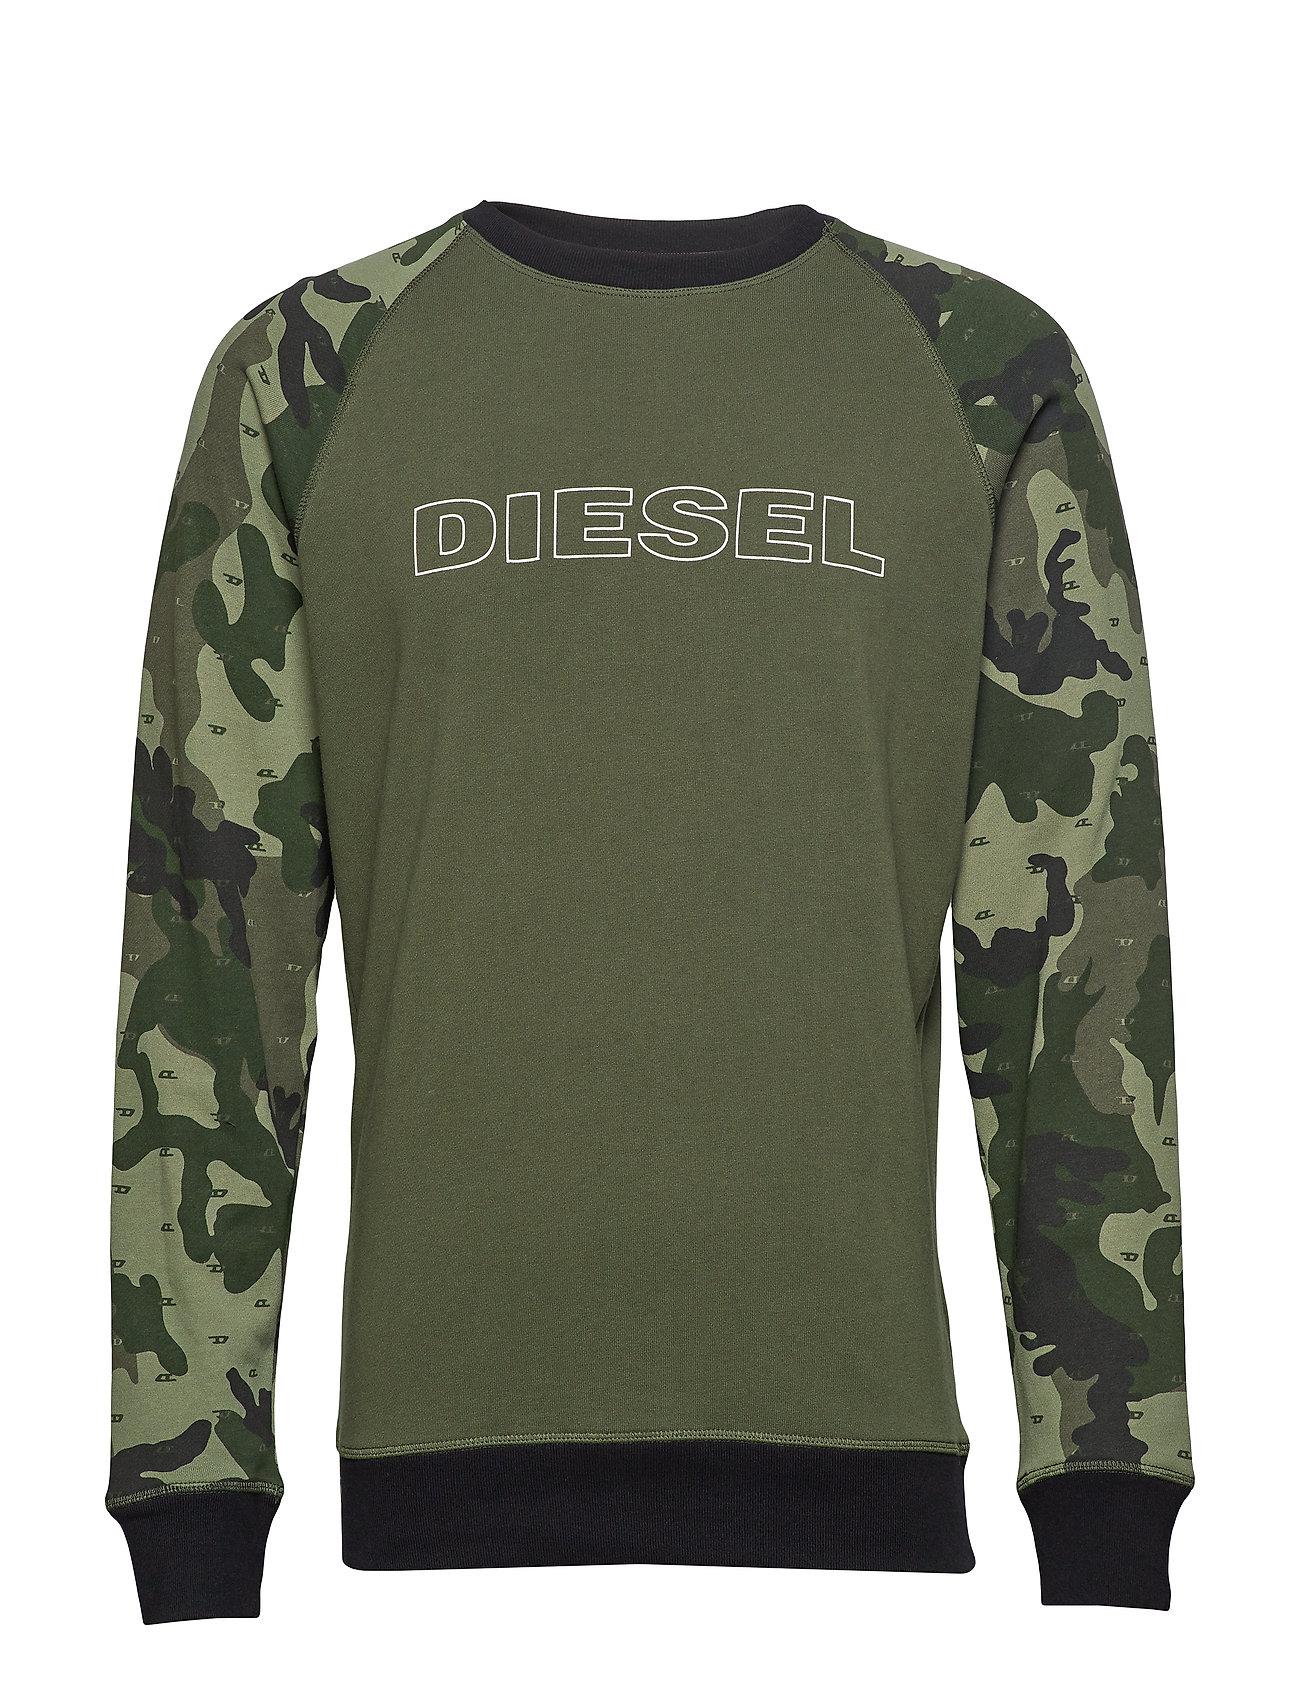 Diesel Men UMLT-MAX SWEAT-SHIRT - GREEN